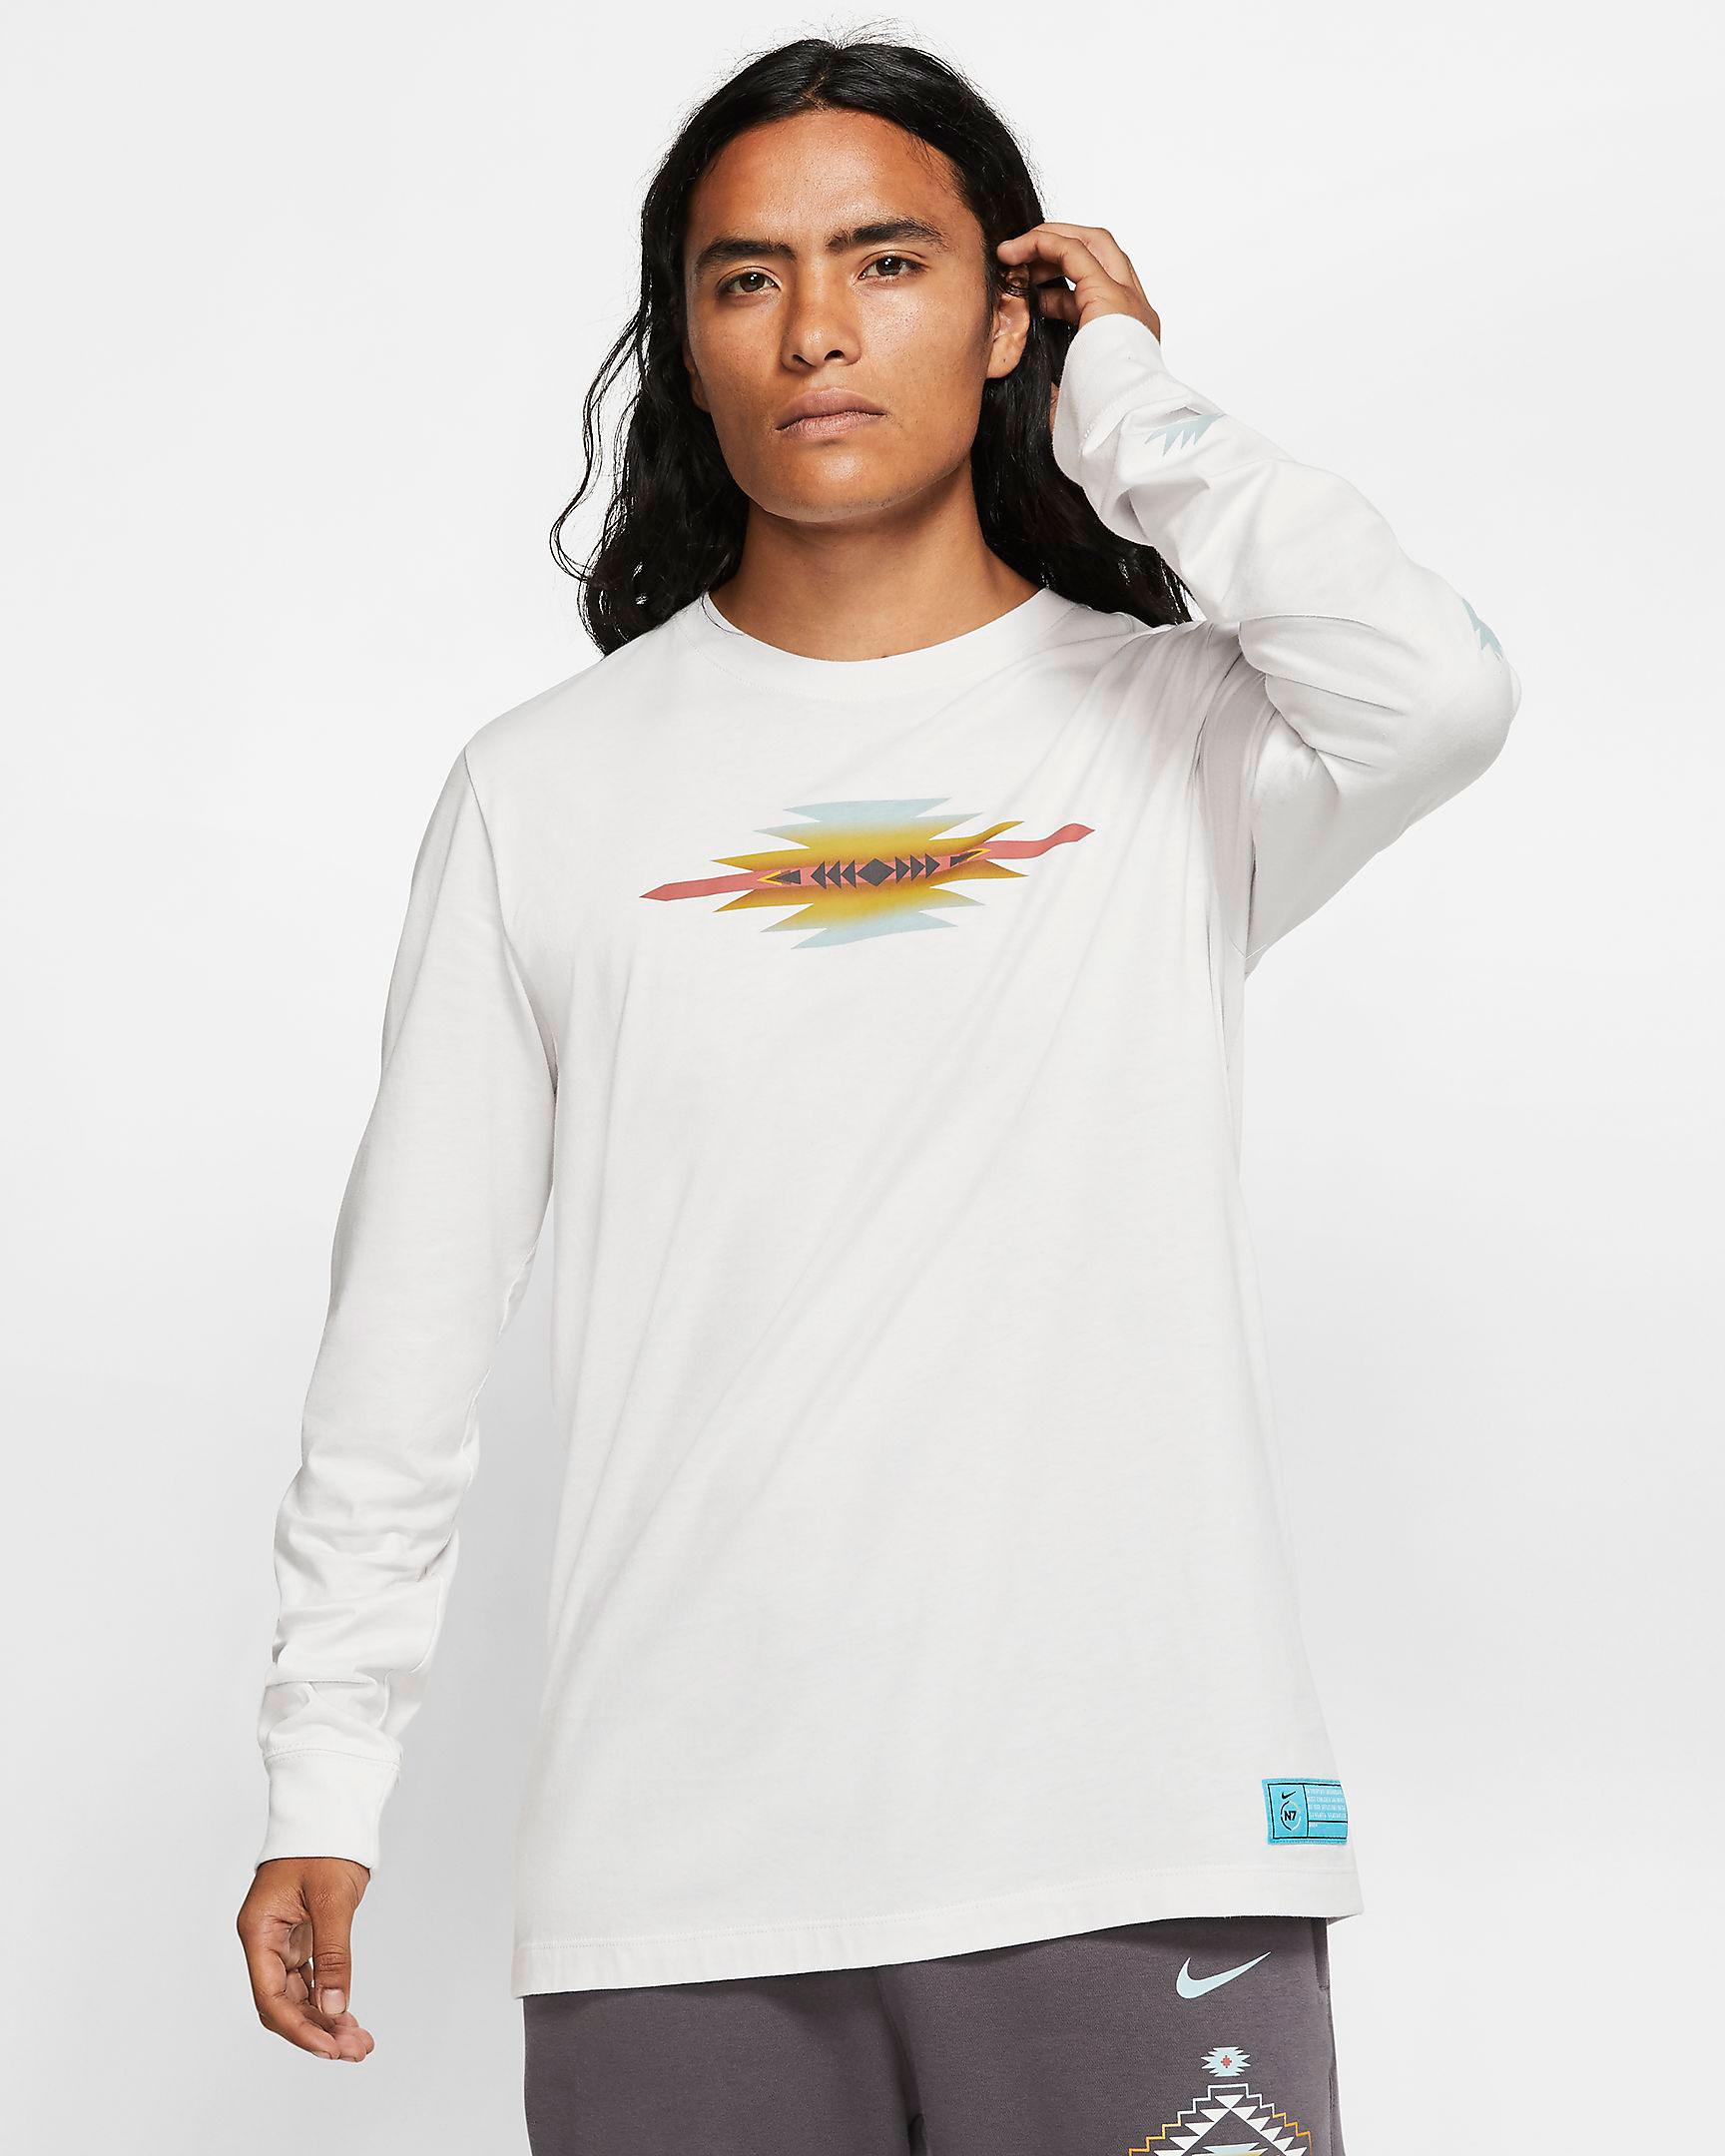 jordan-8-n7-nike-shirt-2